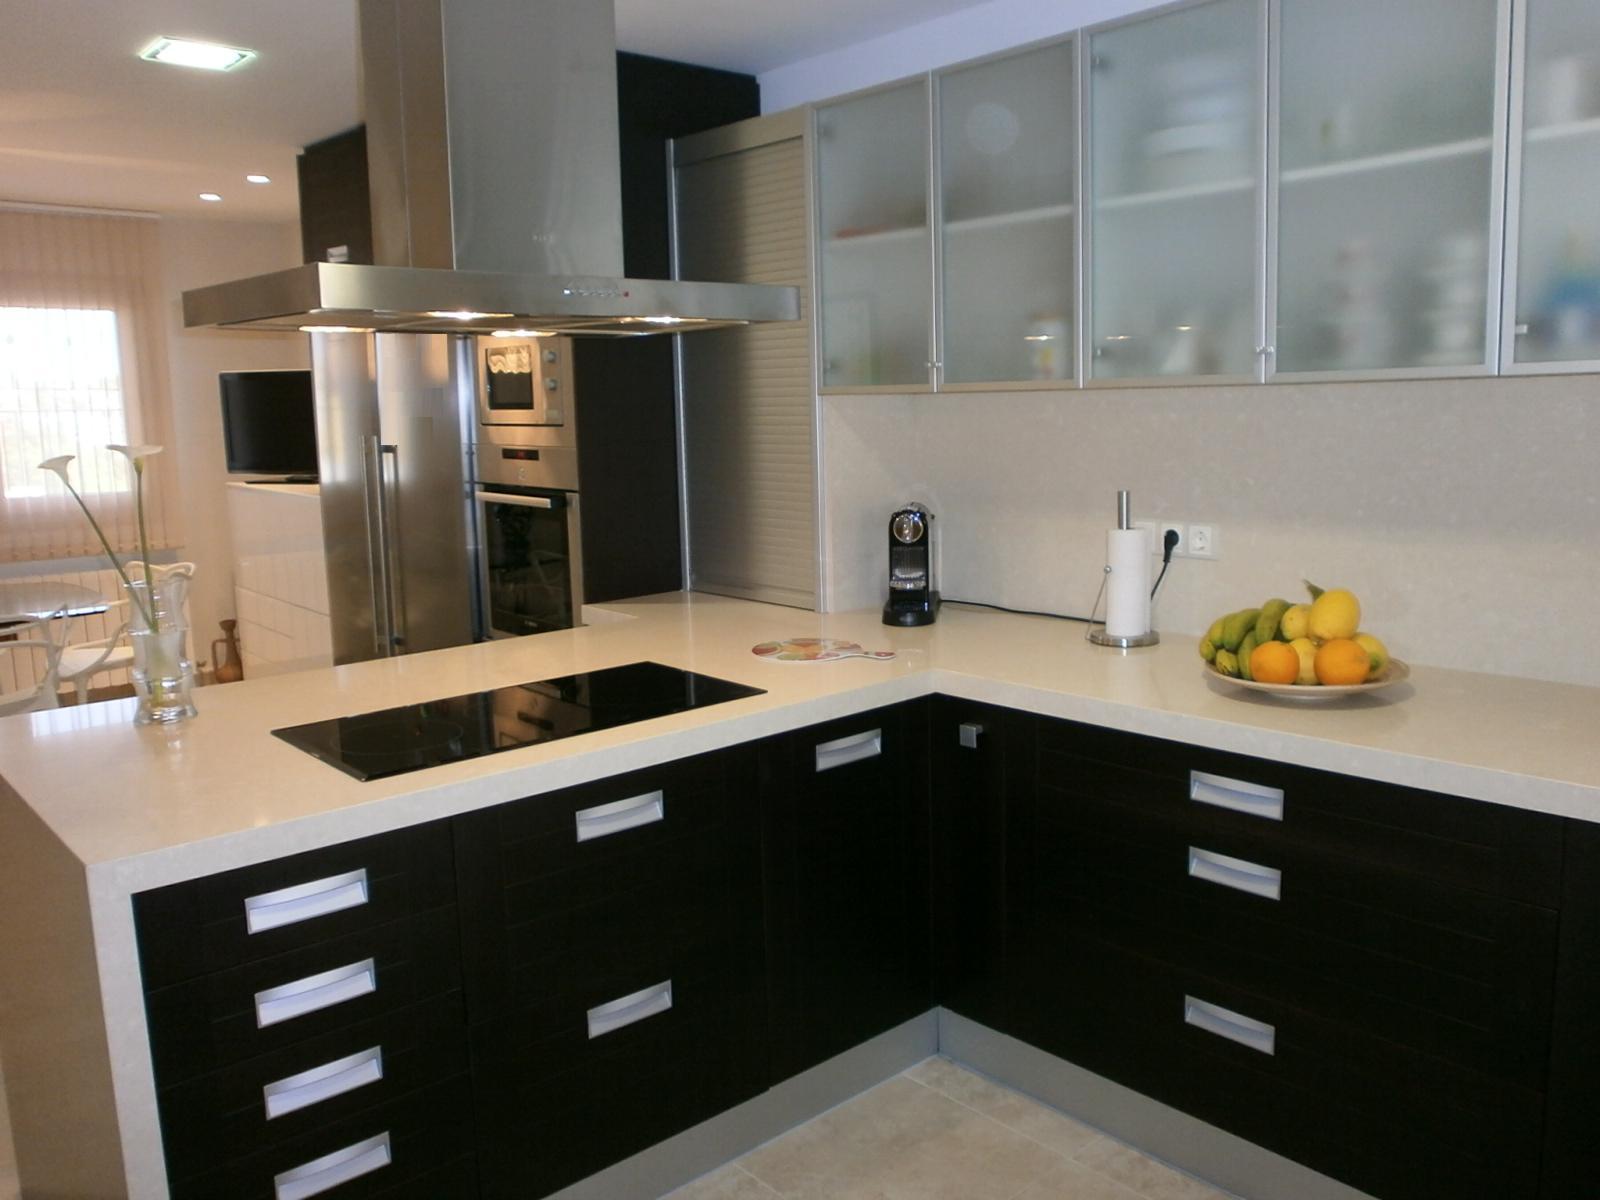 Not for boring black kitchens for Cocinas modernas pequenas cuadradas